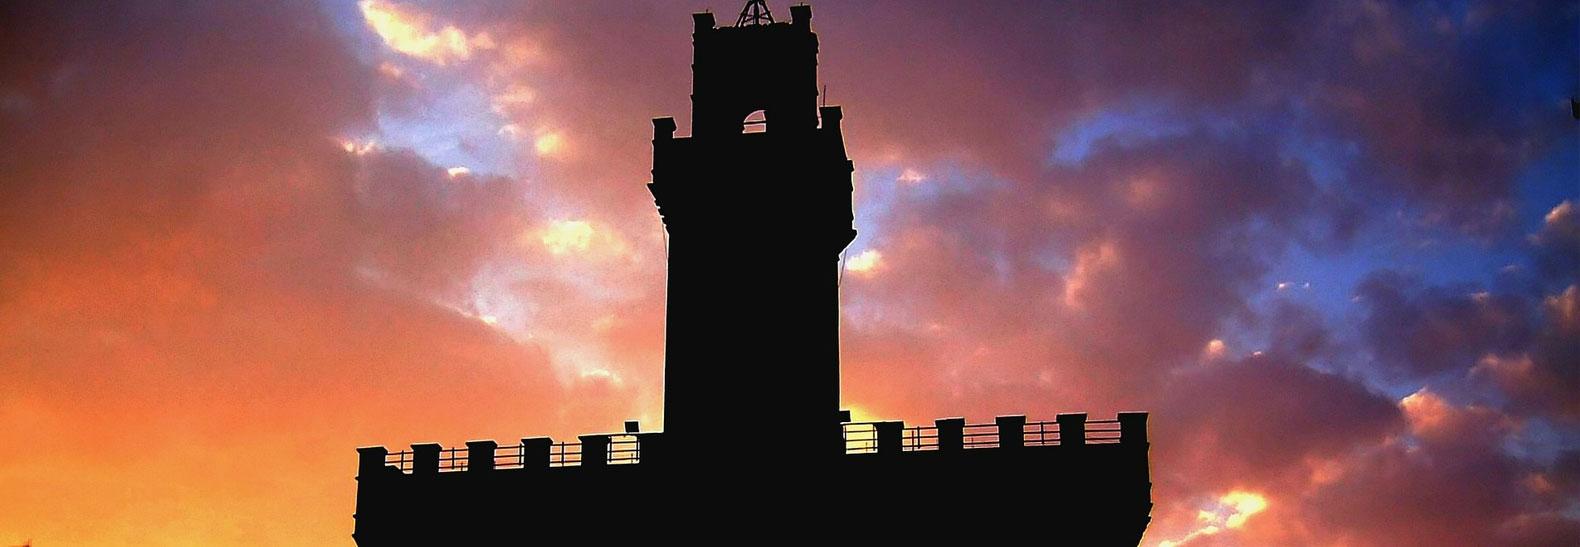 castelli toscana matrimonio